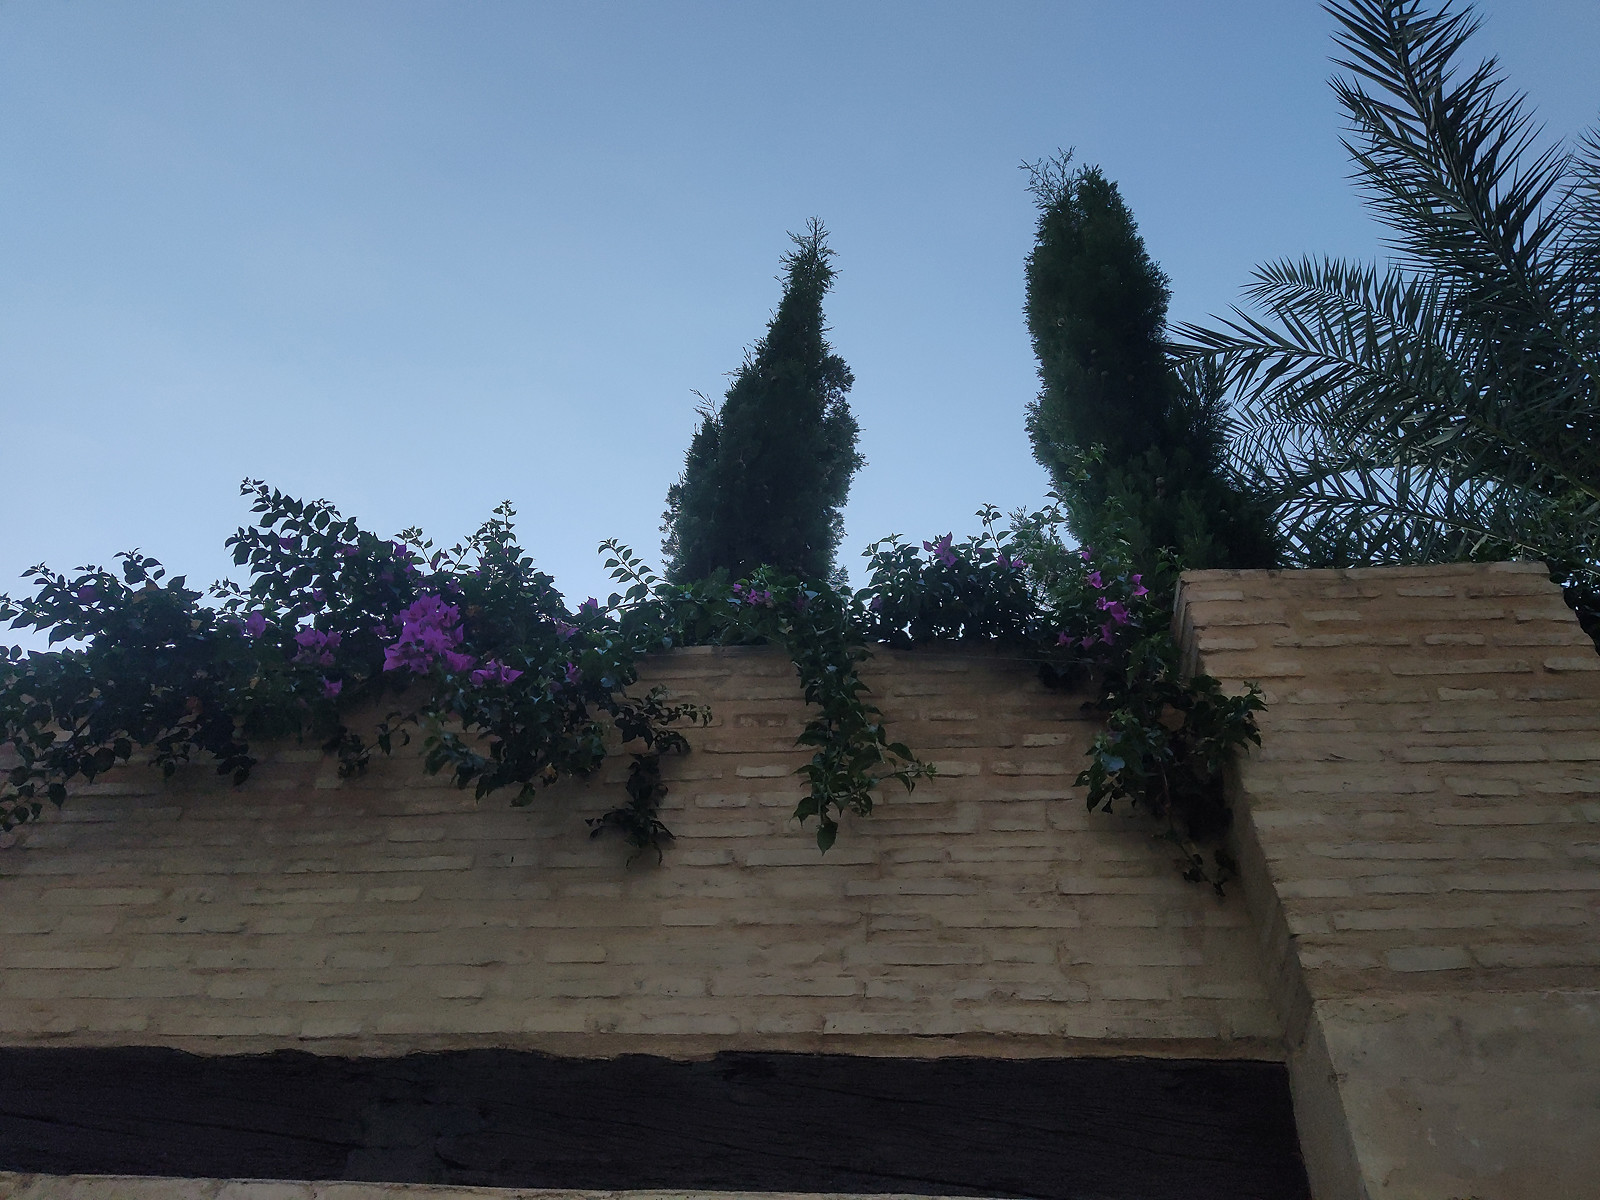 Foto de Nubia Z20 (8/31)